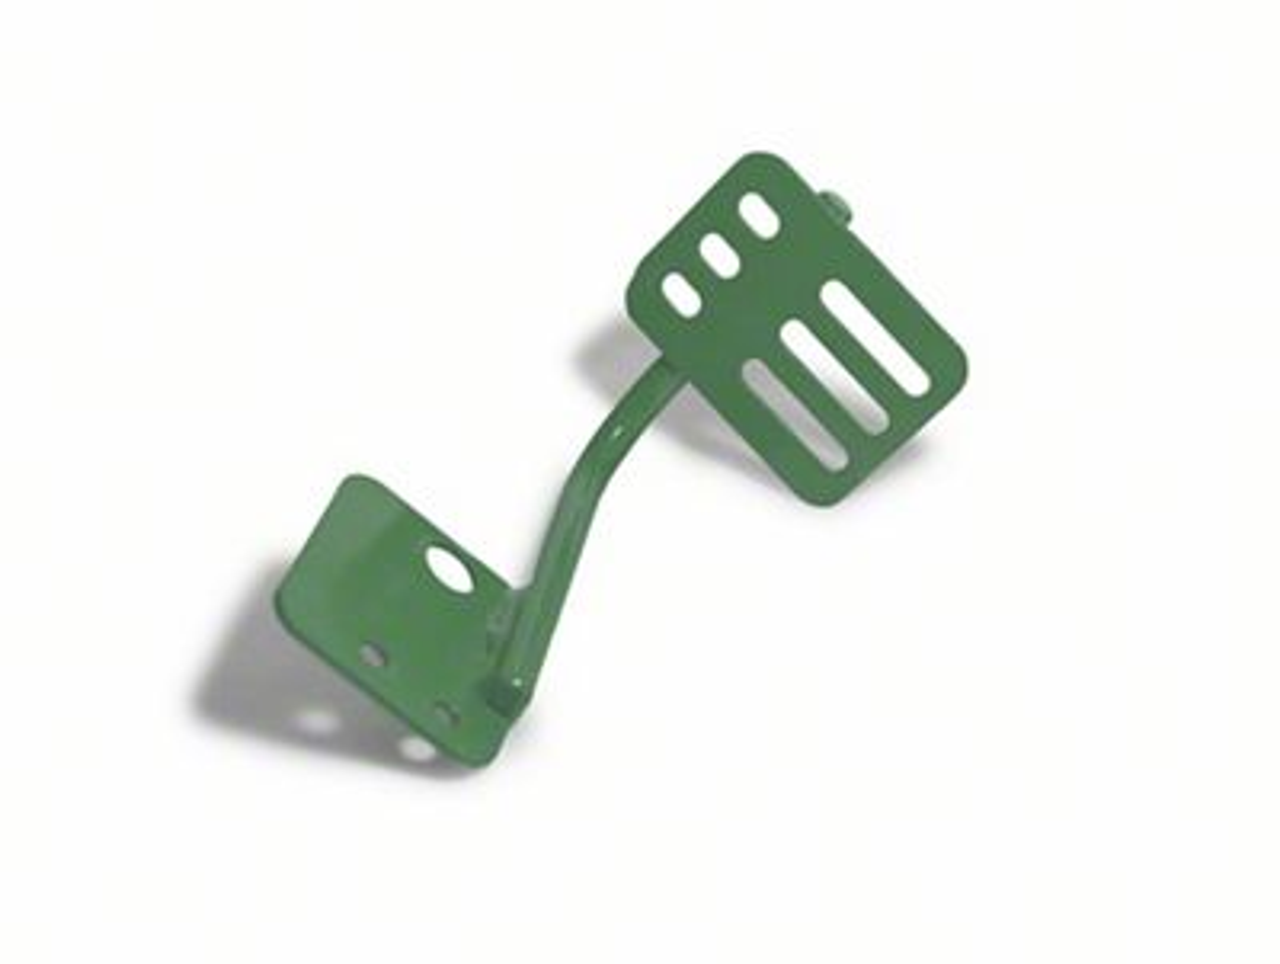 Steinjager Dead Pedal - Locas Green (07-18 Jeep Wrangler JK)